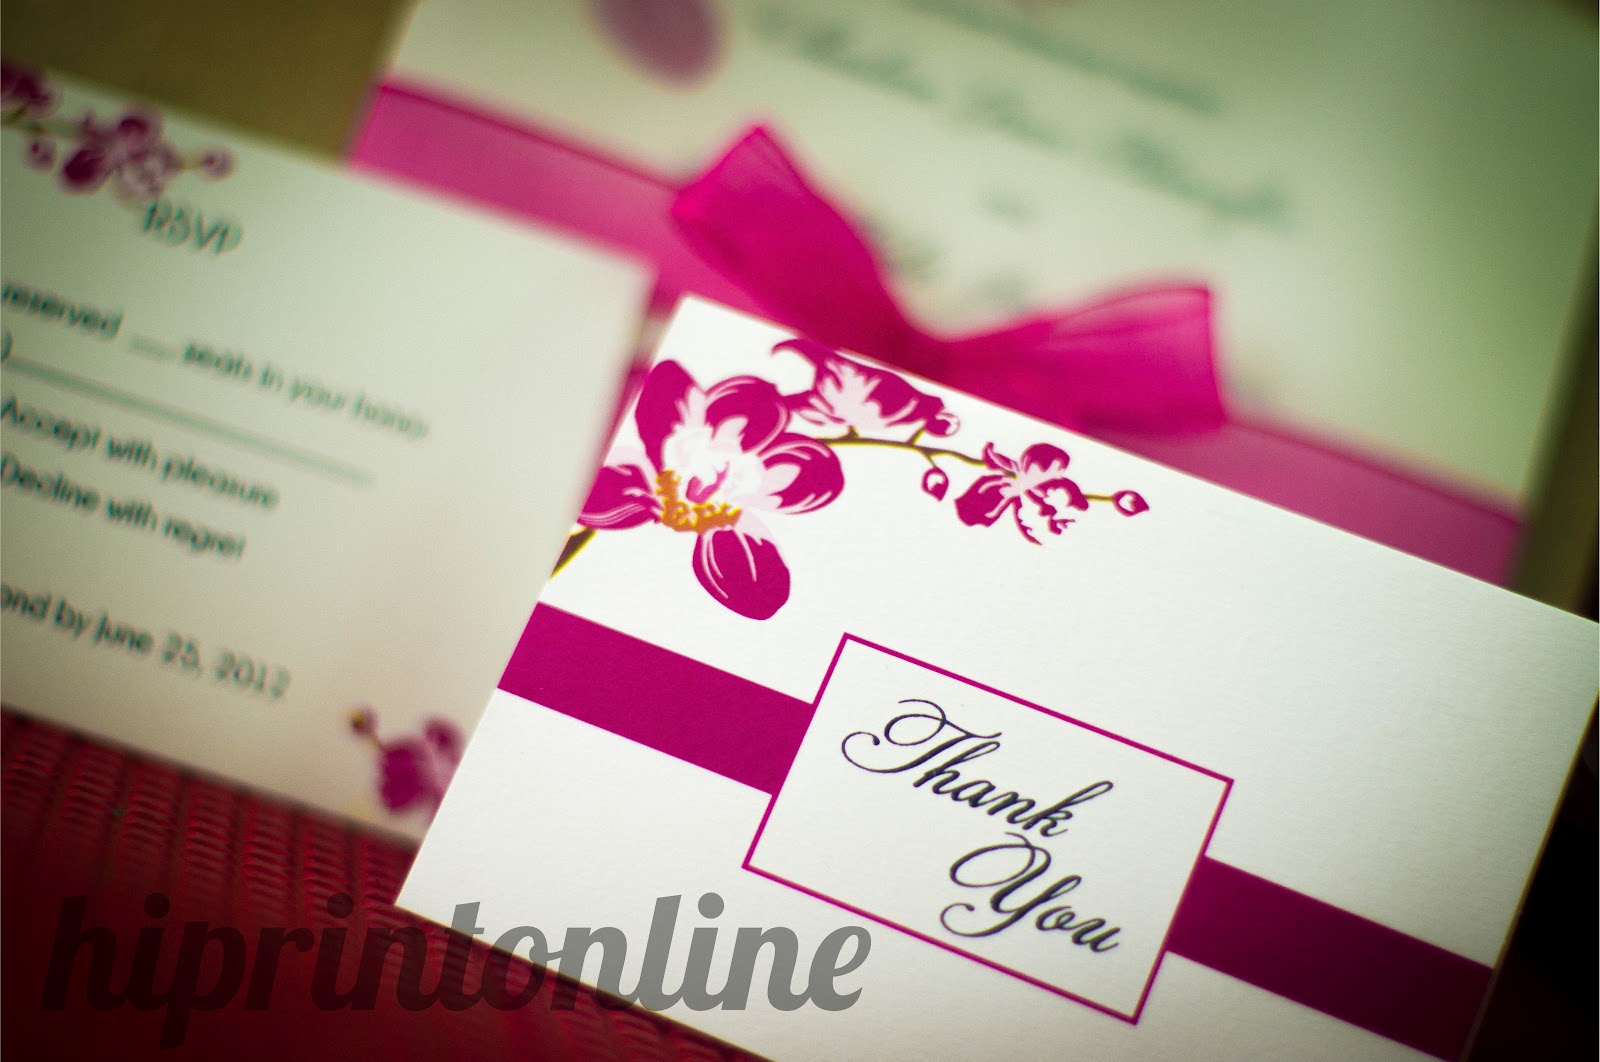 Wedding invitation maker in manila picture ideas references wedding invitation maker in manila printing press for wedding invitations manila blancaflor cullen wedding invitation stopboris Images